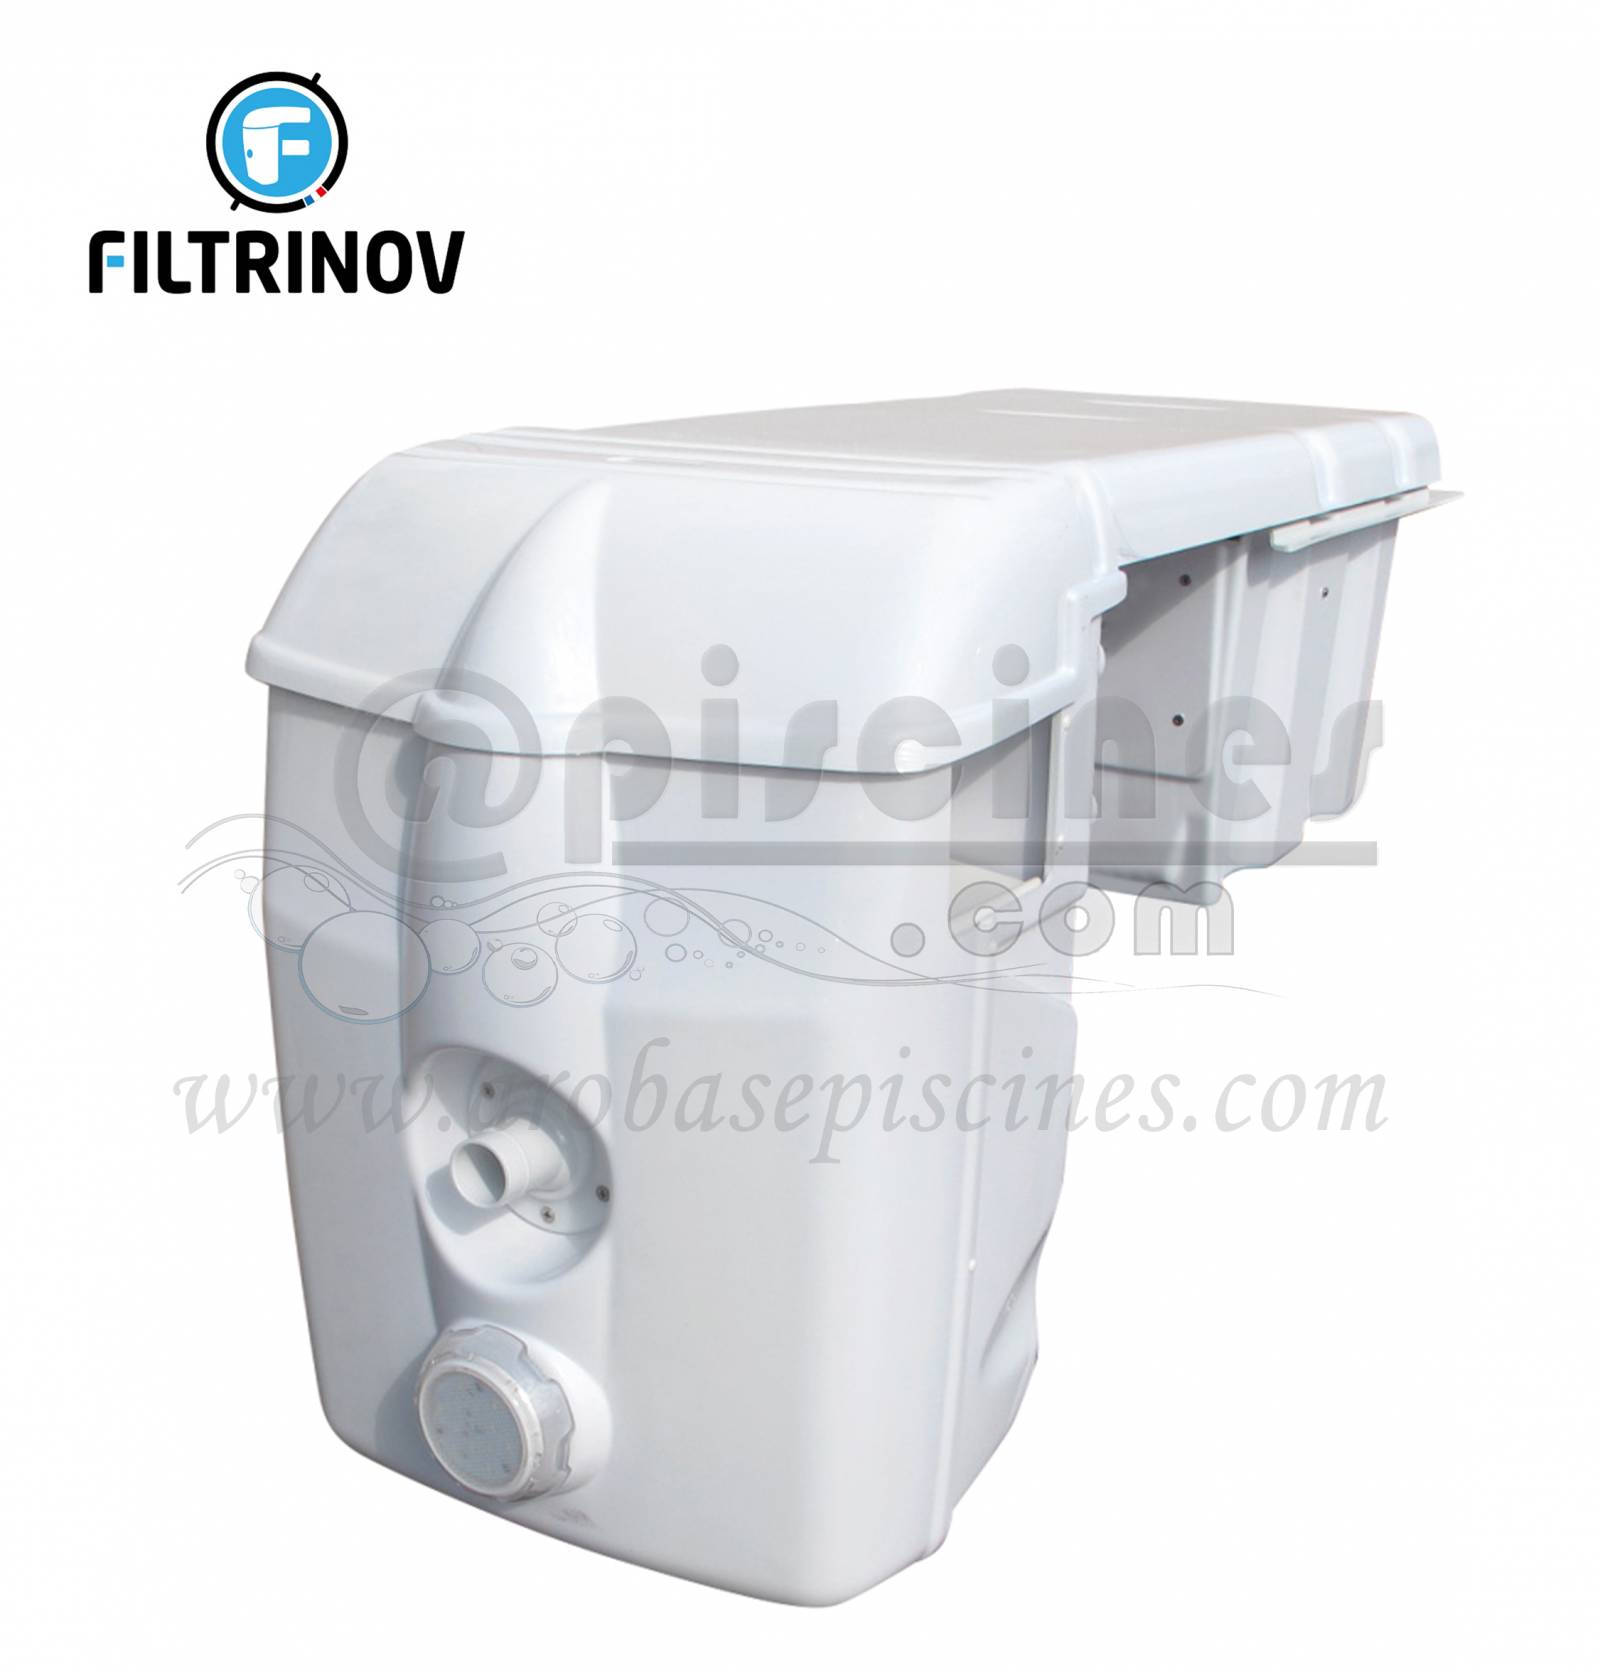 Bloc Filtrant Filtrinov Mx 18 Avec Electrolyseur Au Sel Regulation